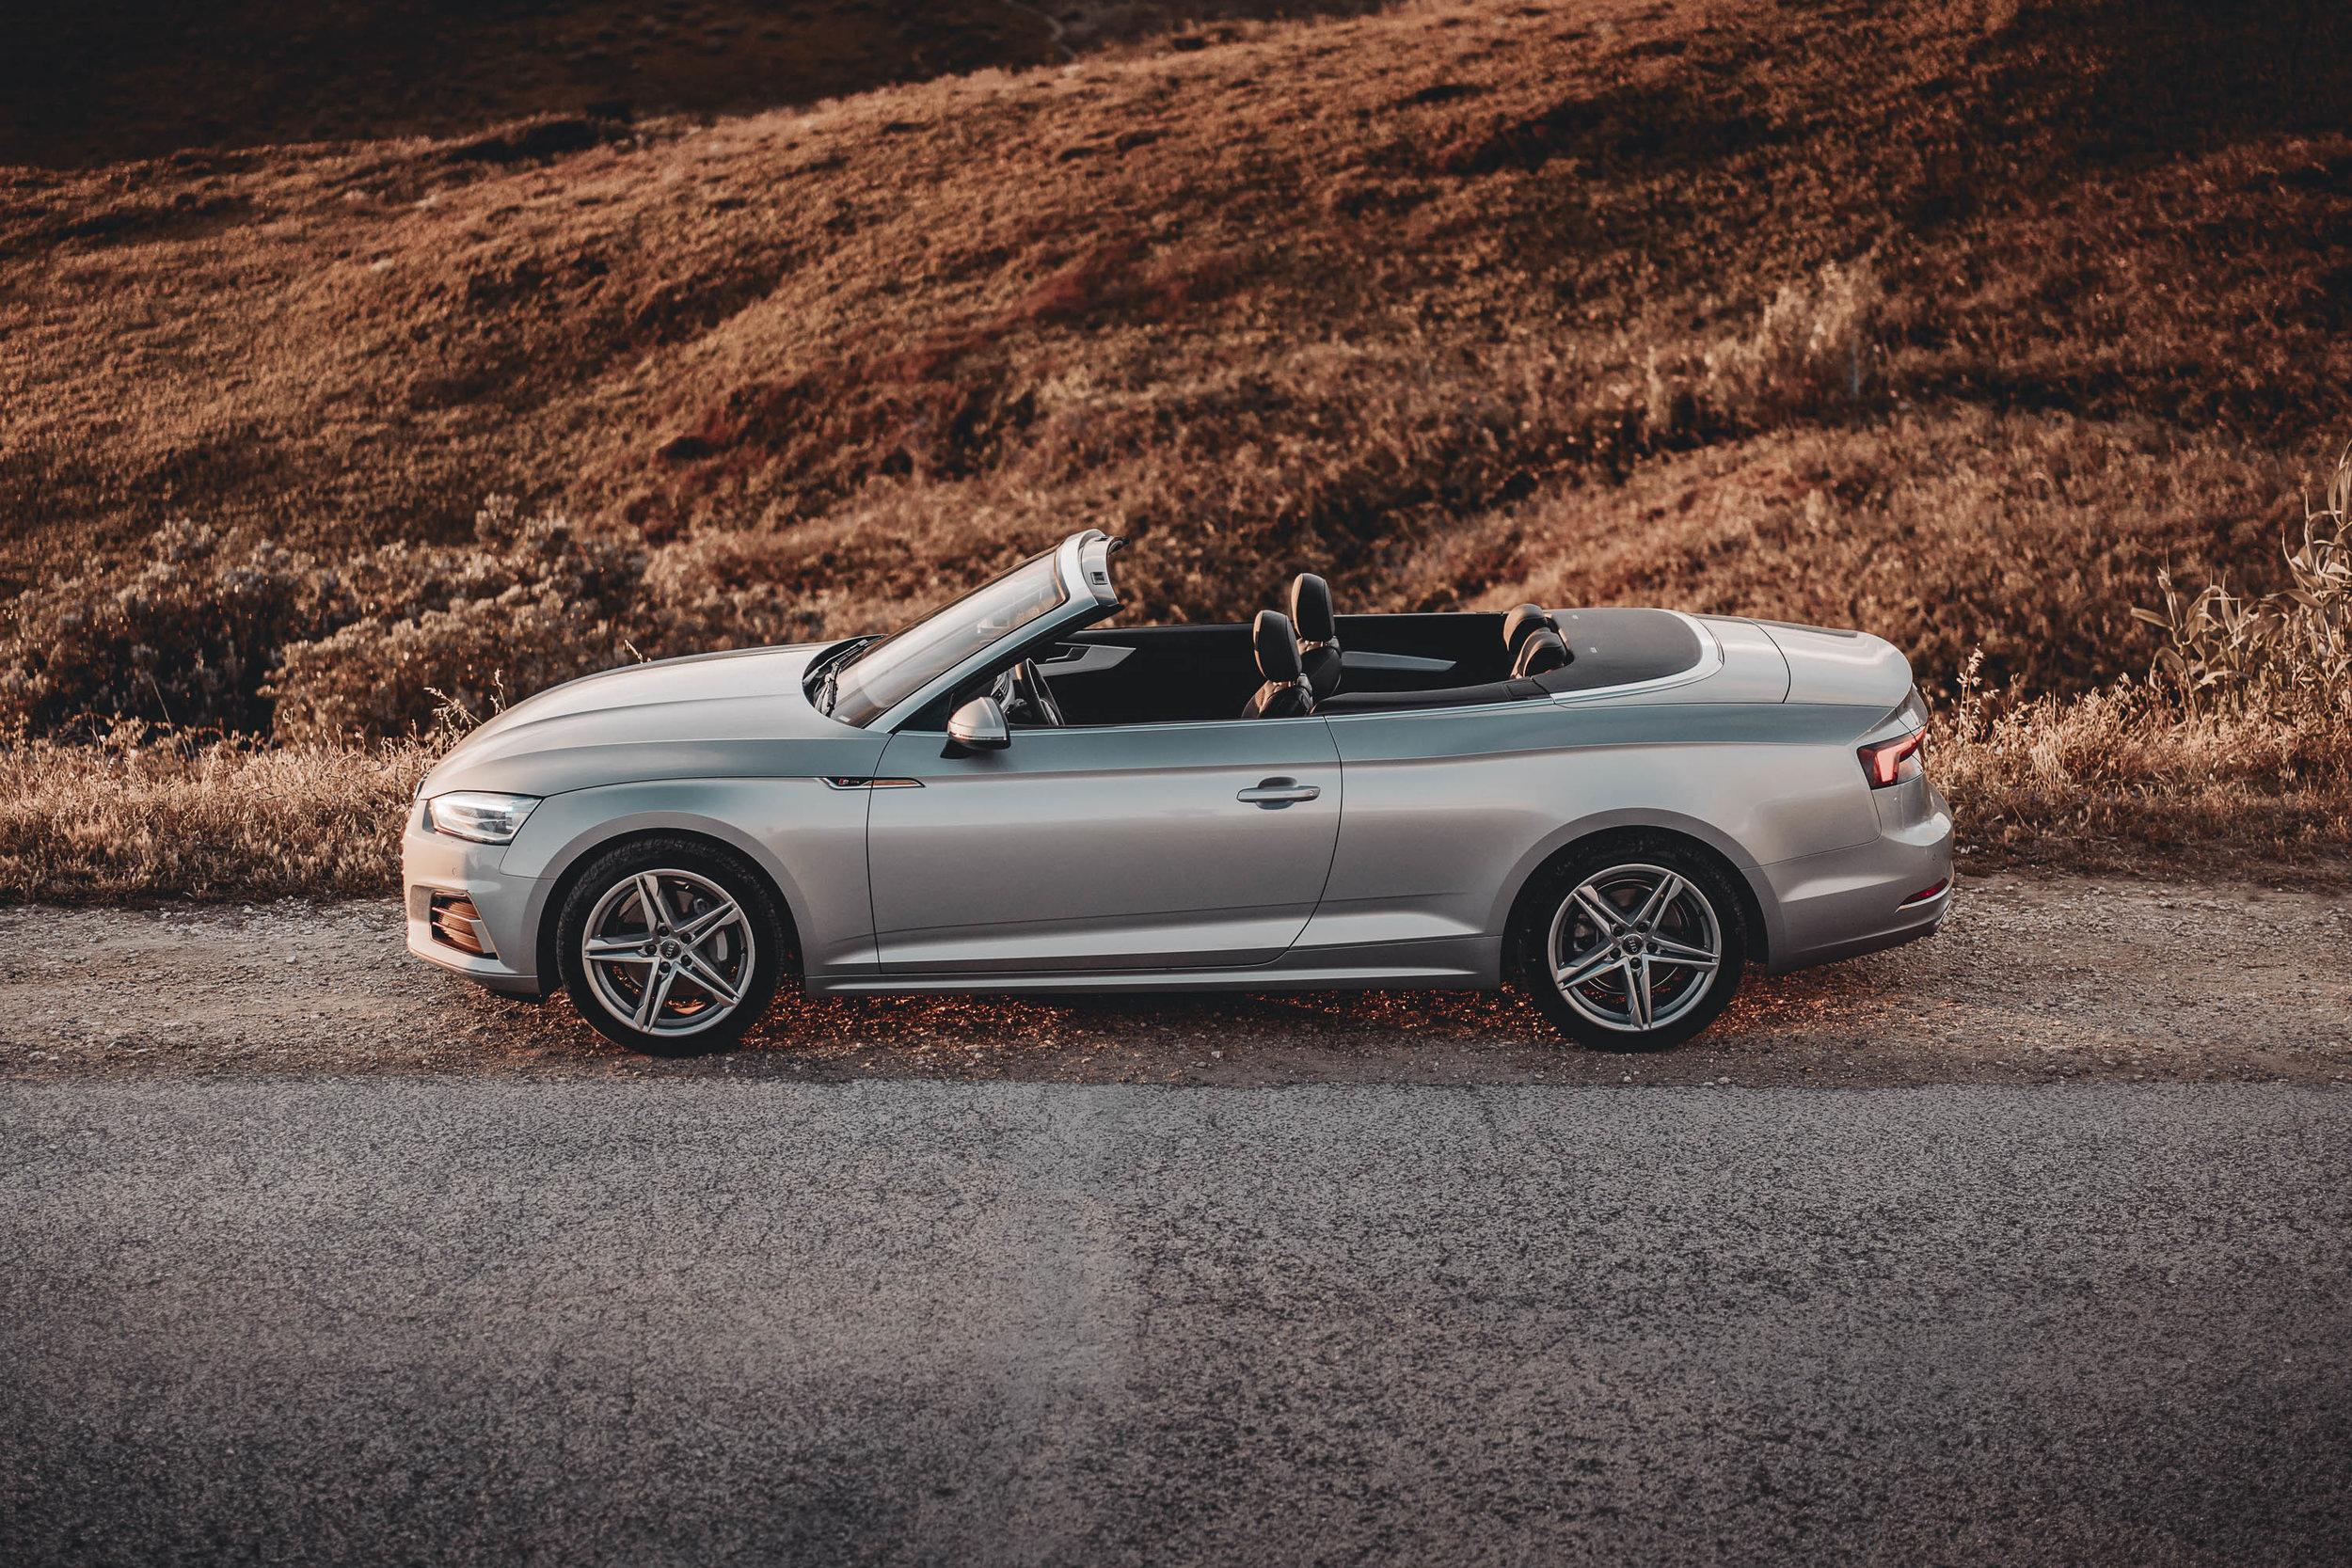 Maximilian_Otto_Audi_A5_Cabriolet_Portugal_04_WEB.jpg